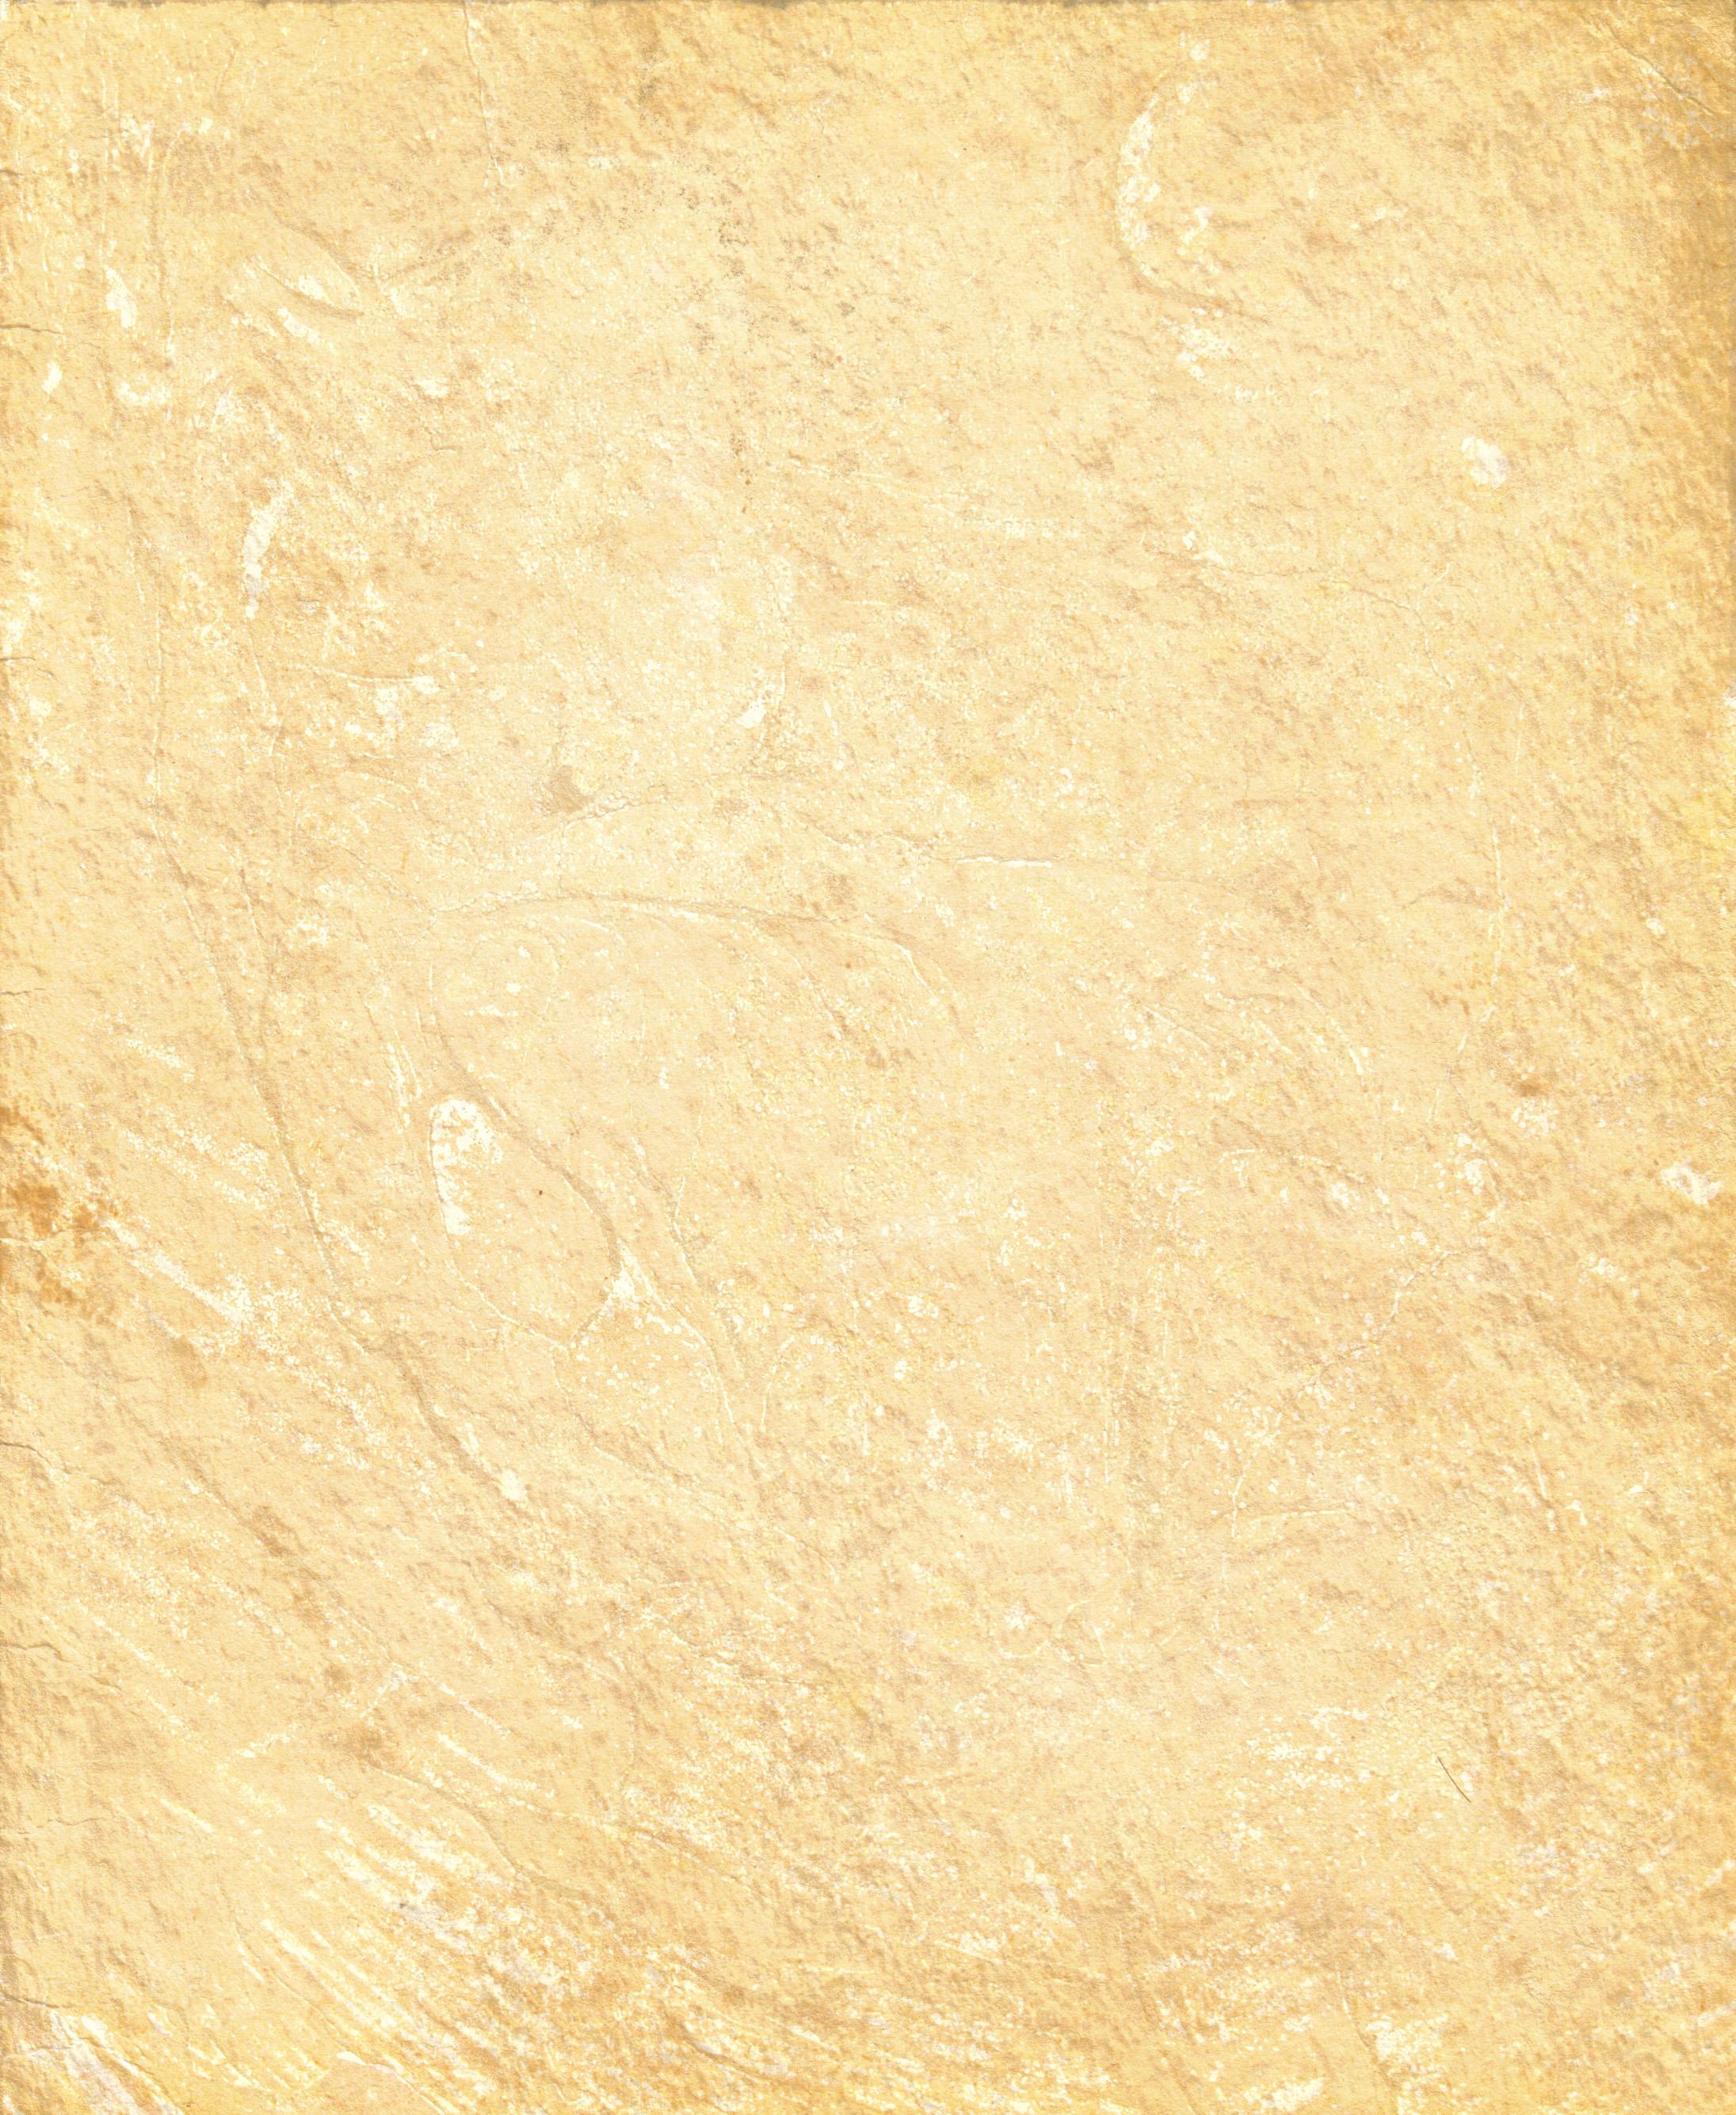 paper texture by akinna-stock on DeviantArt